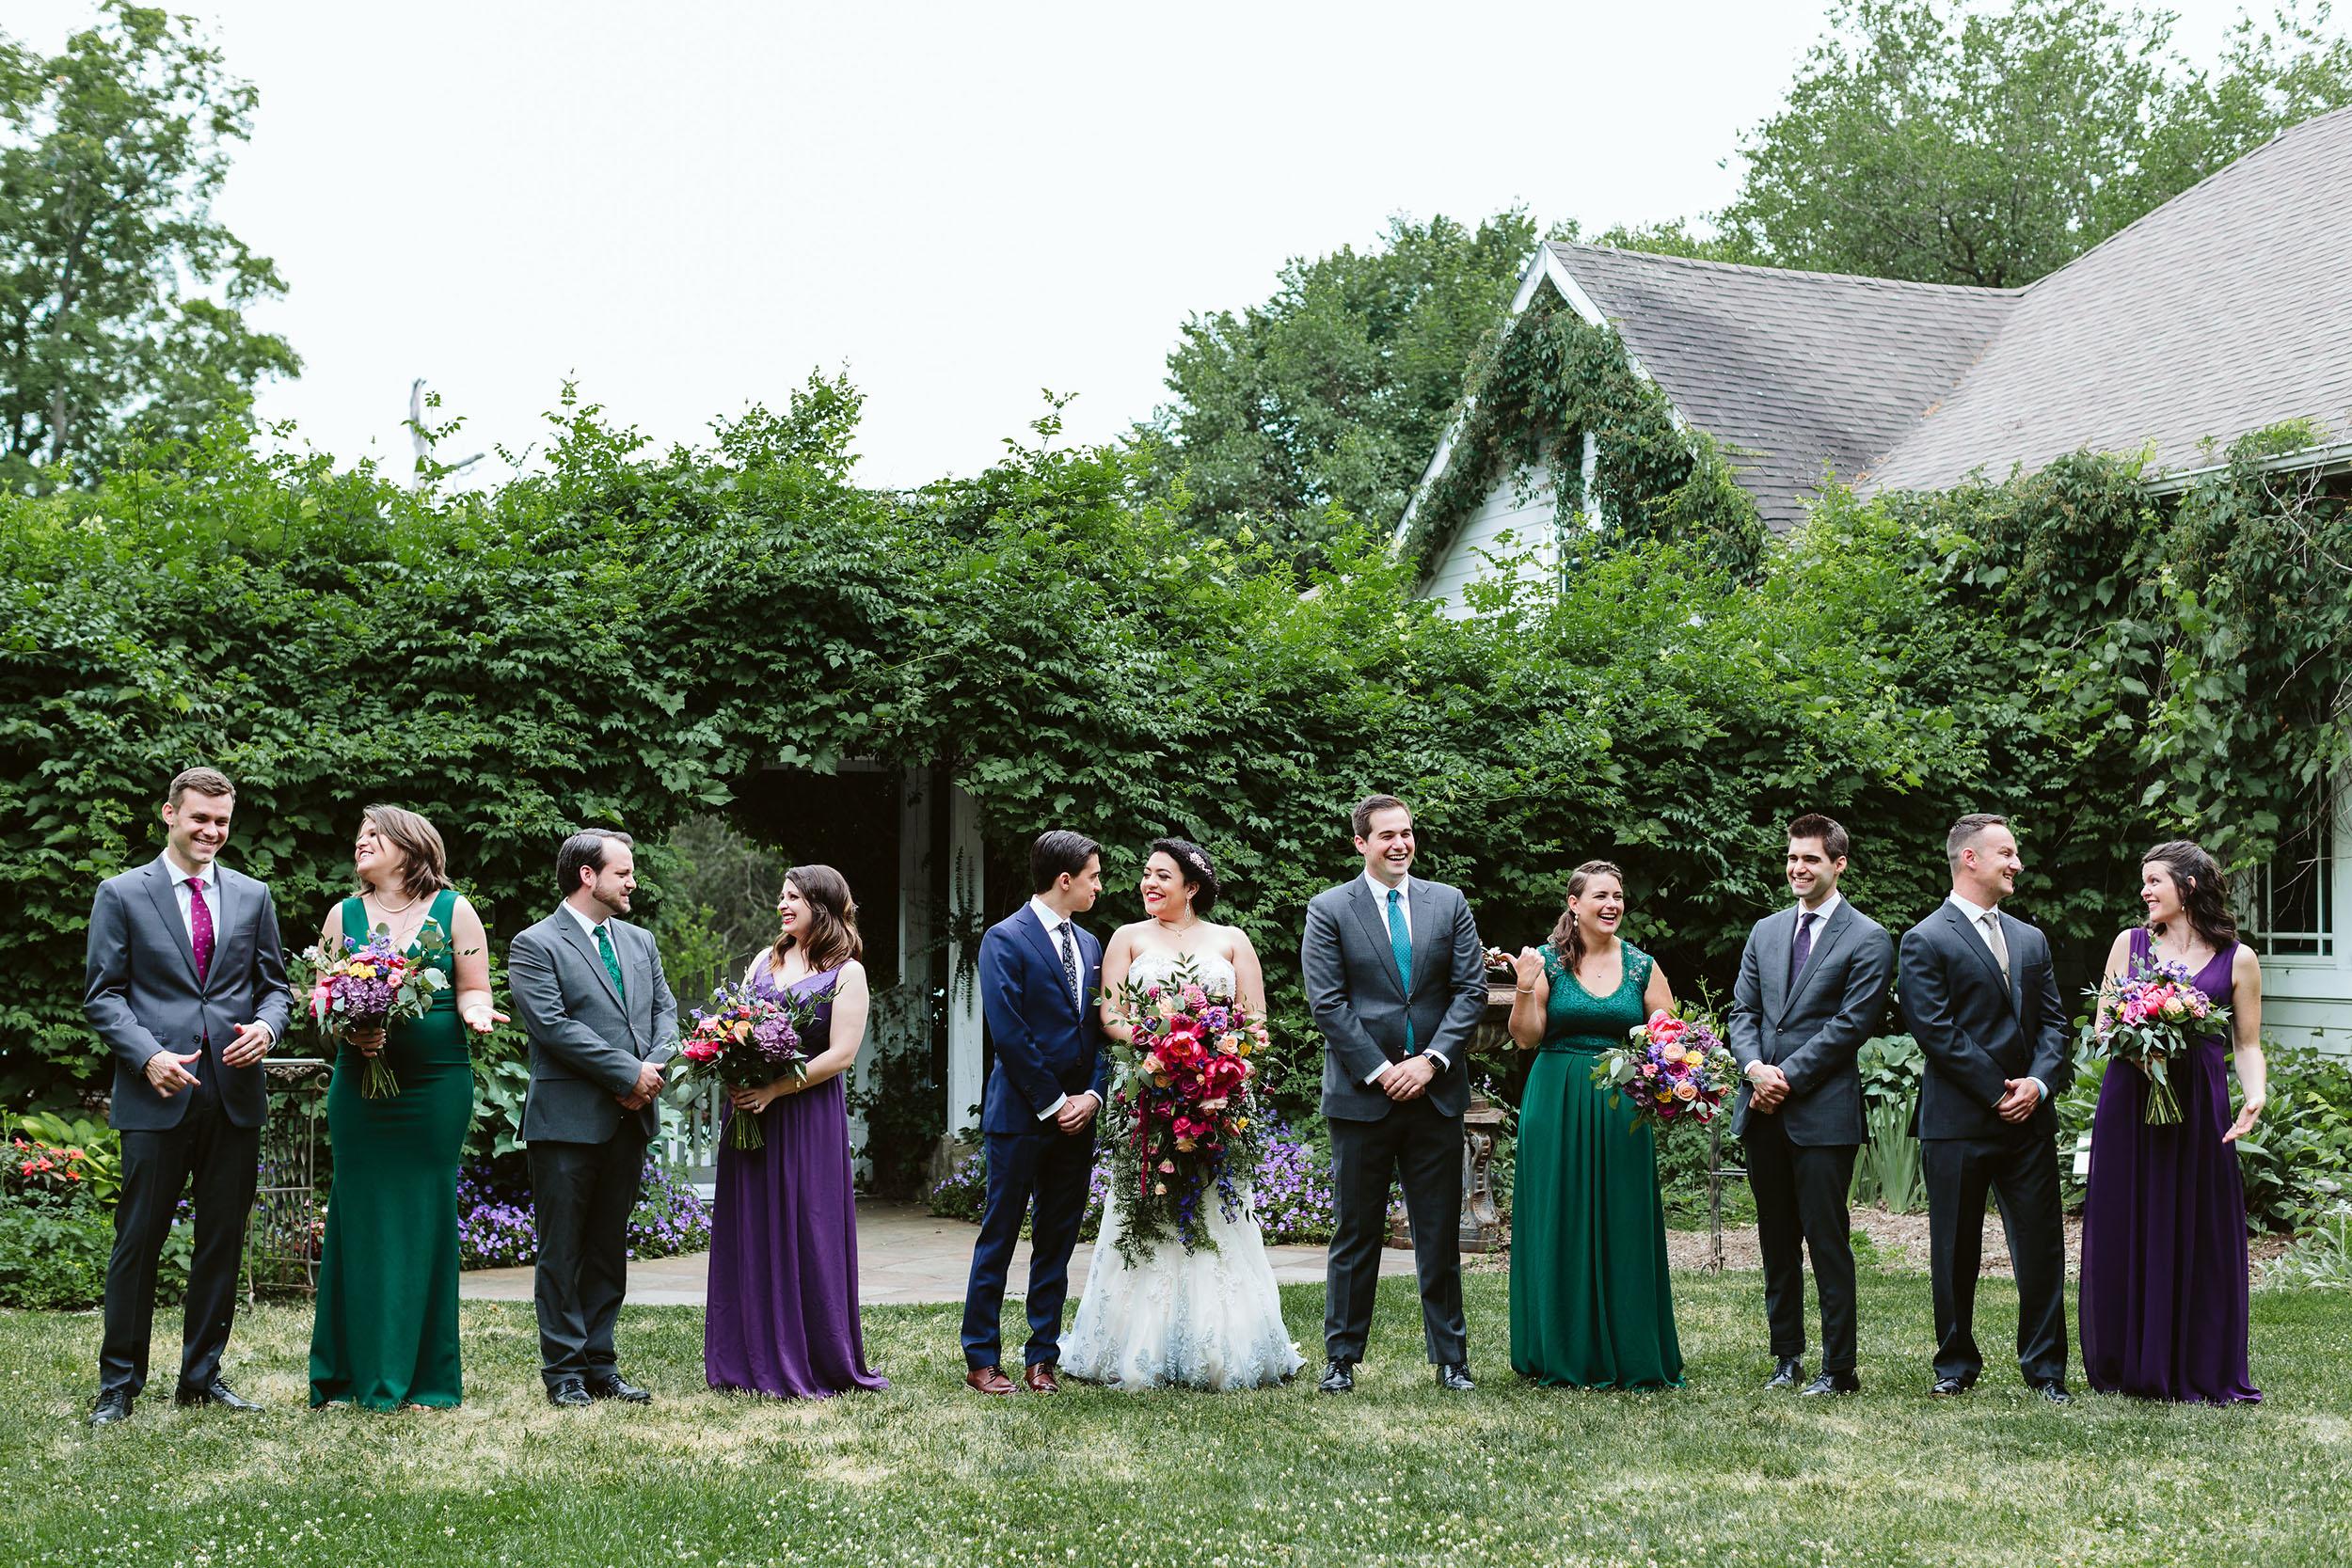 KarliCadel-Wedding-TiffanyNick-1185-2.jpg